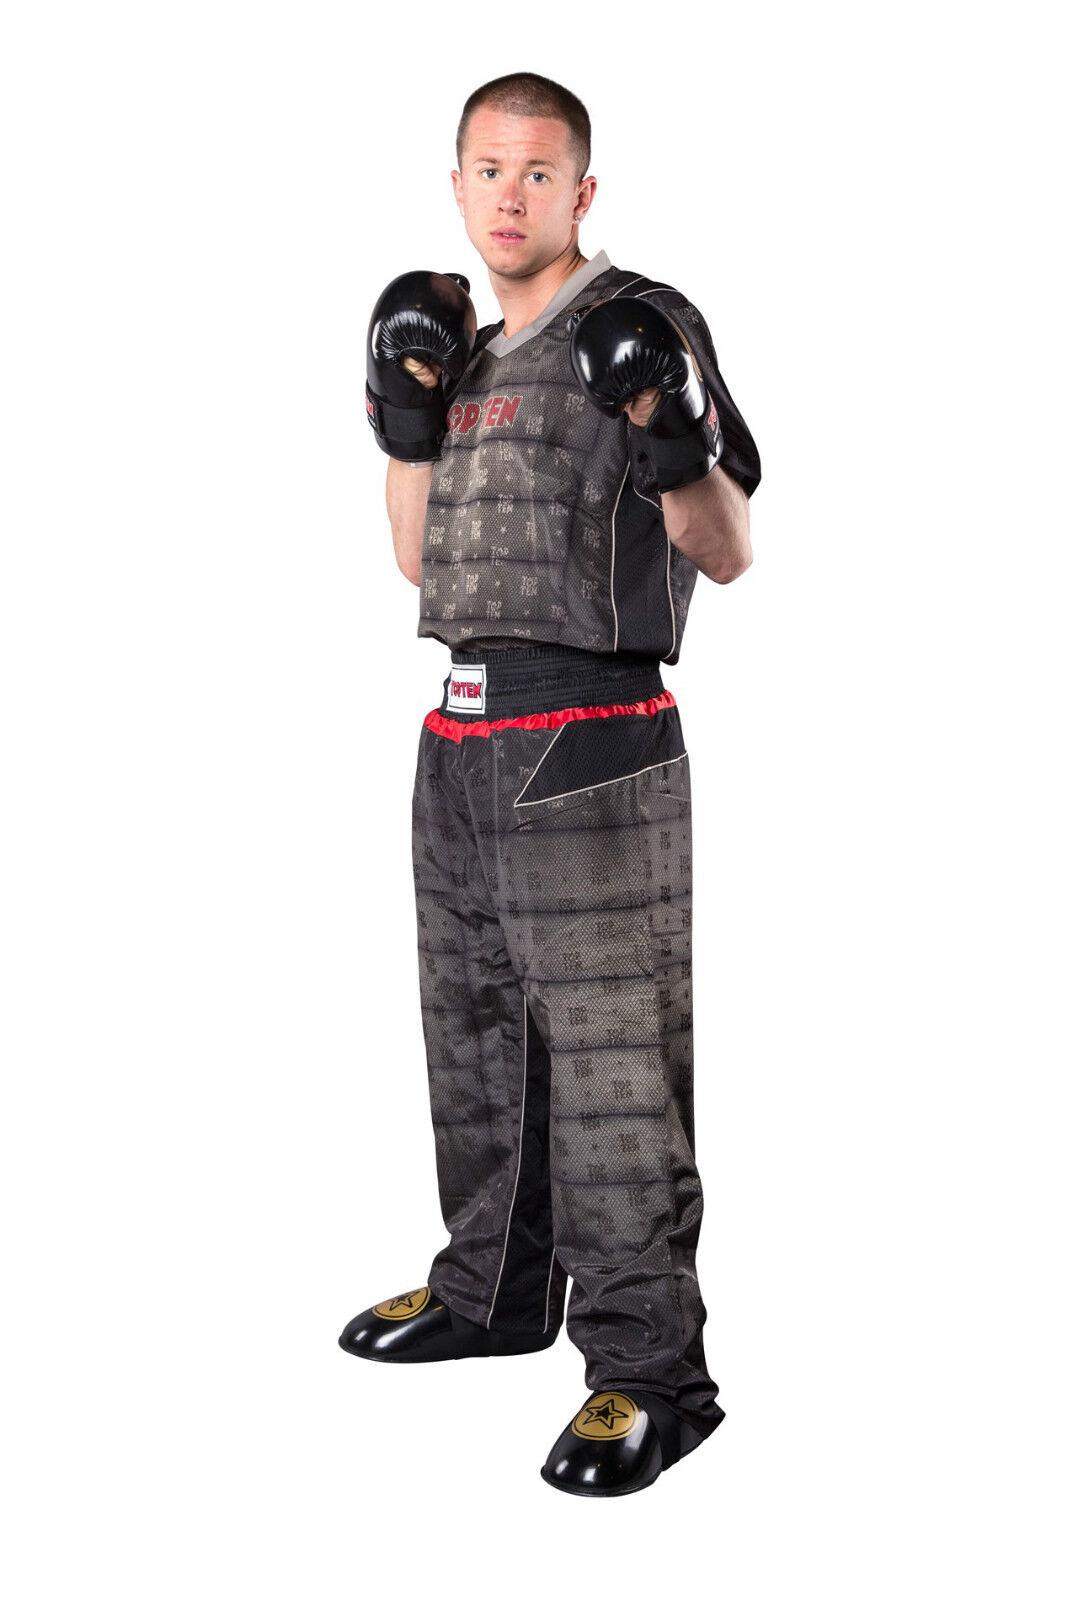 Kickboxuniform TOP TEN Snake. Kickboxen Kickboxing Kickboxanzug. Kickboxanzug. Kickboxanzug. 130cm-200cm. 8d8c30